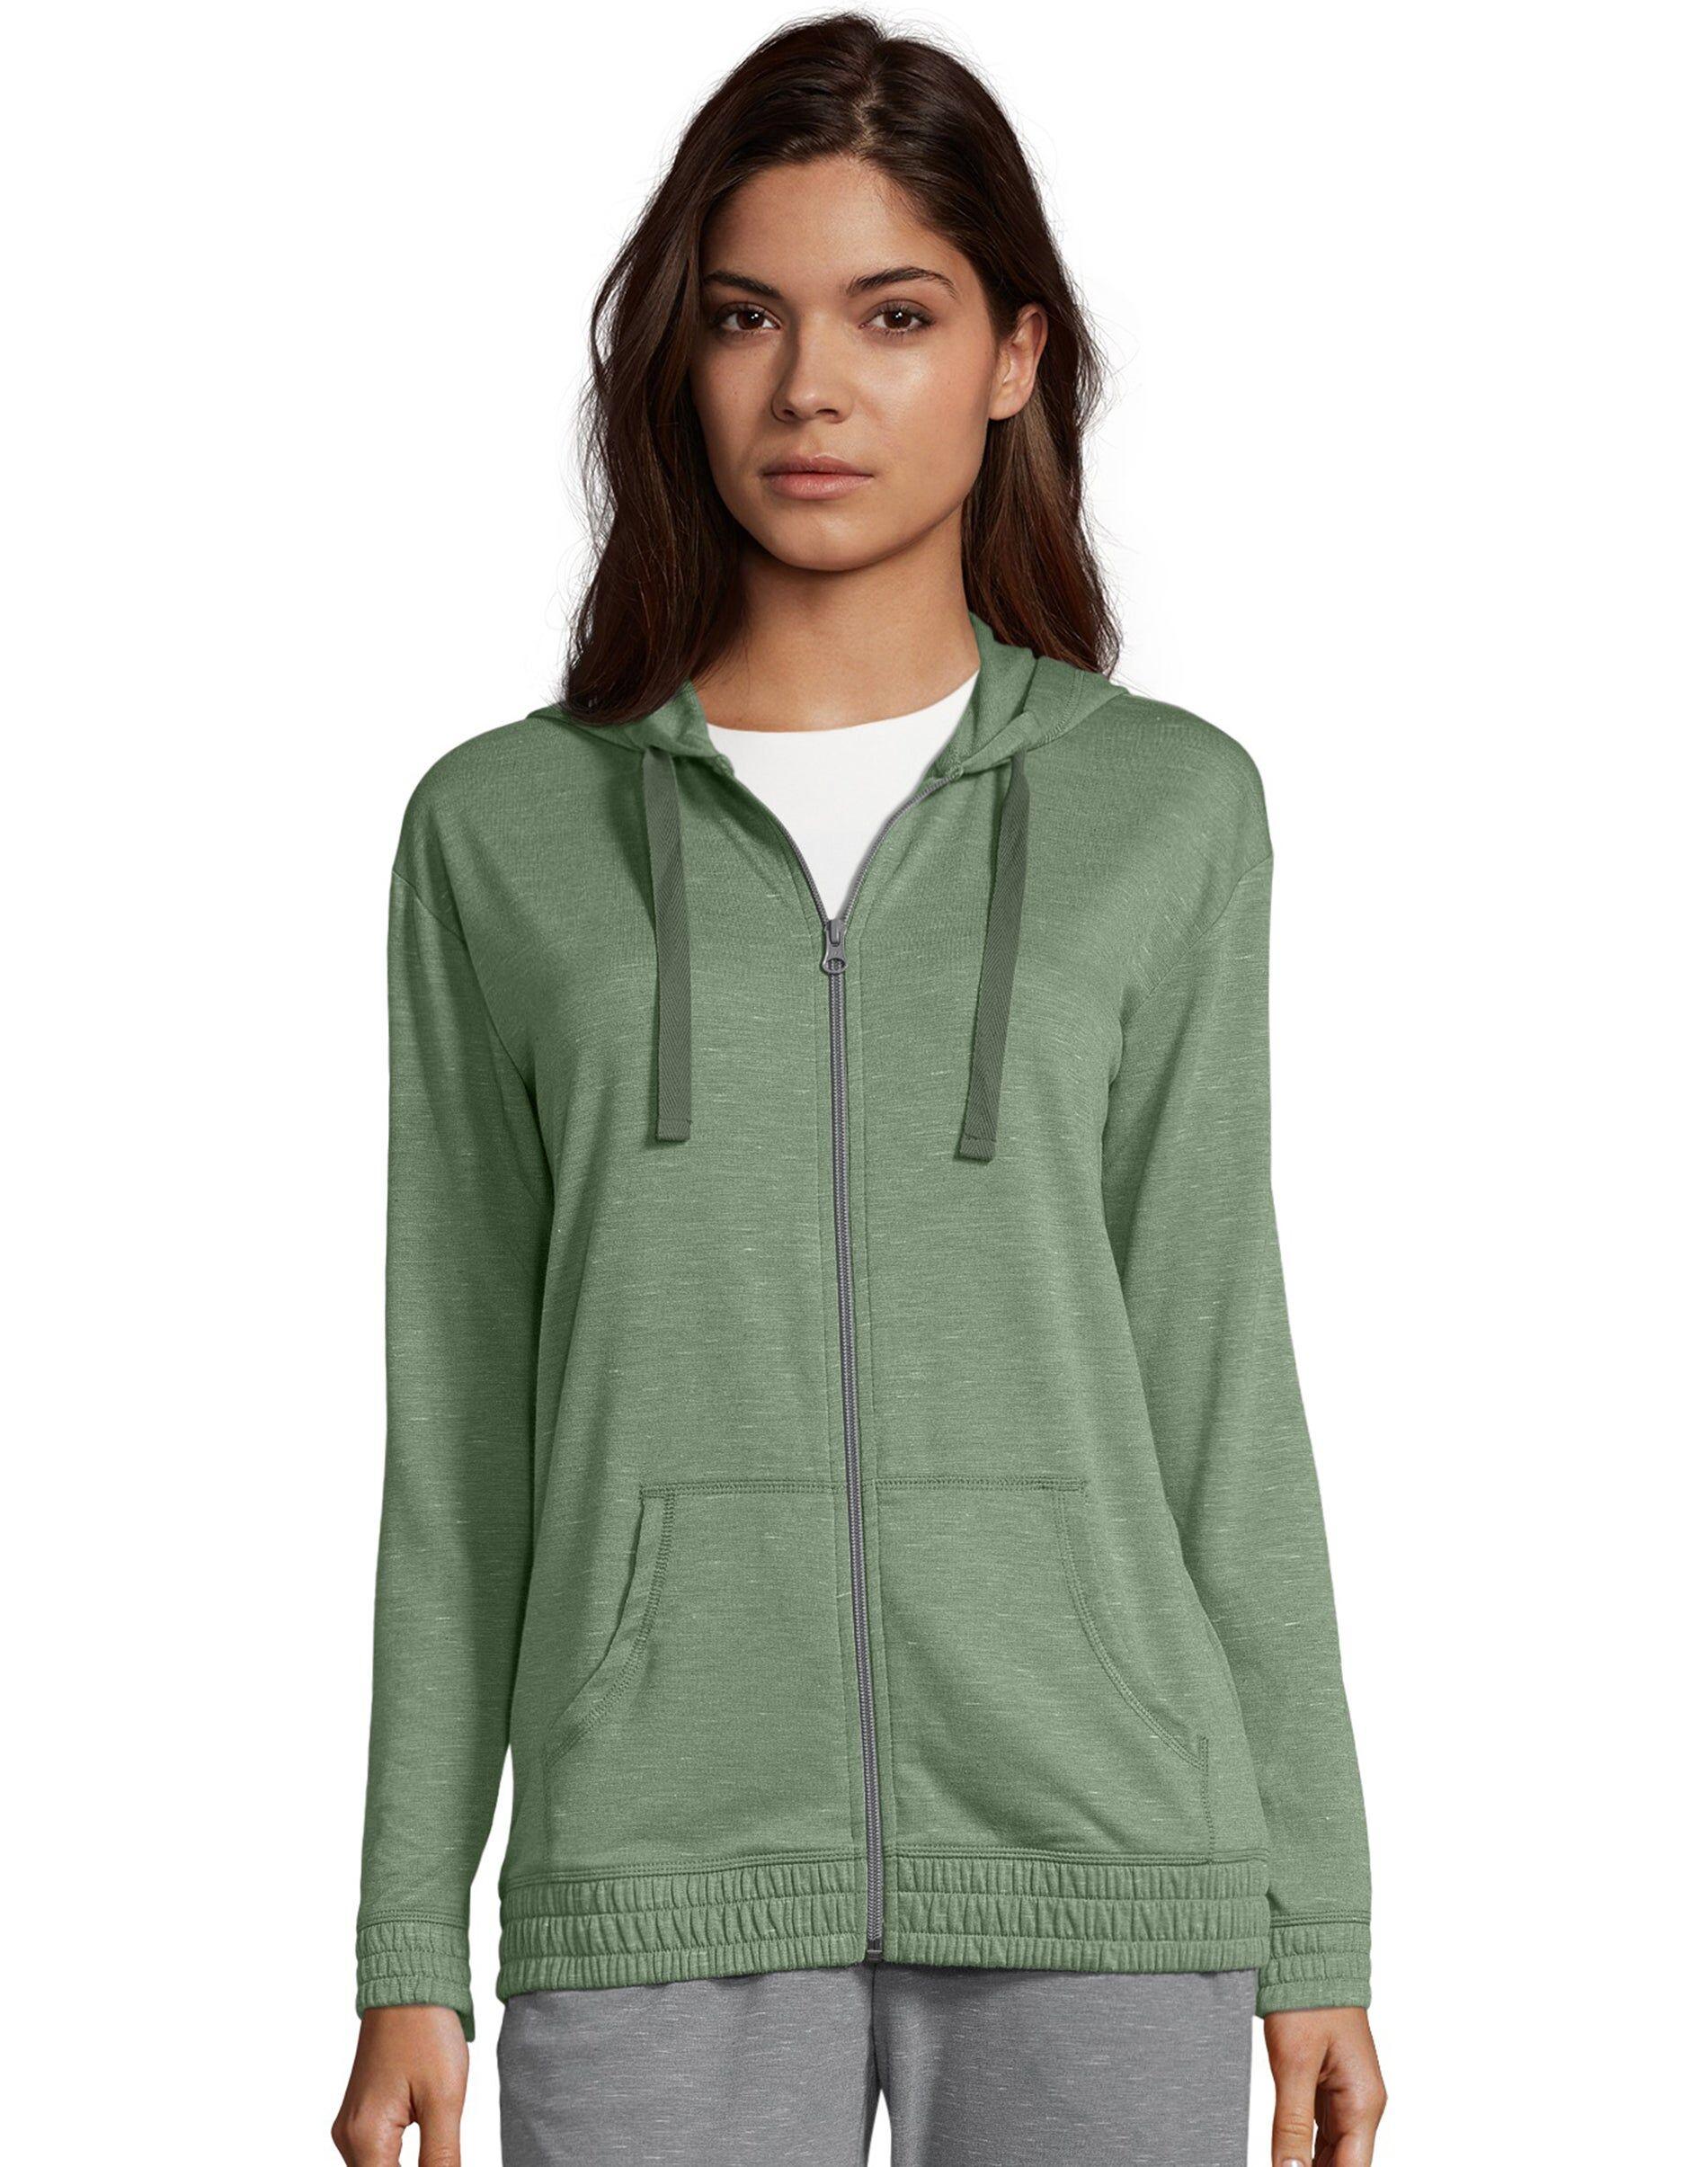 Hanes Women's French Terry Full Zip Hoodie Nature Green Heather M